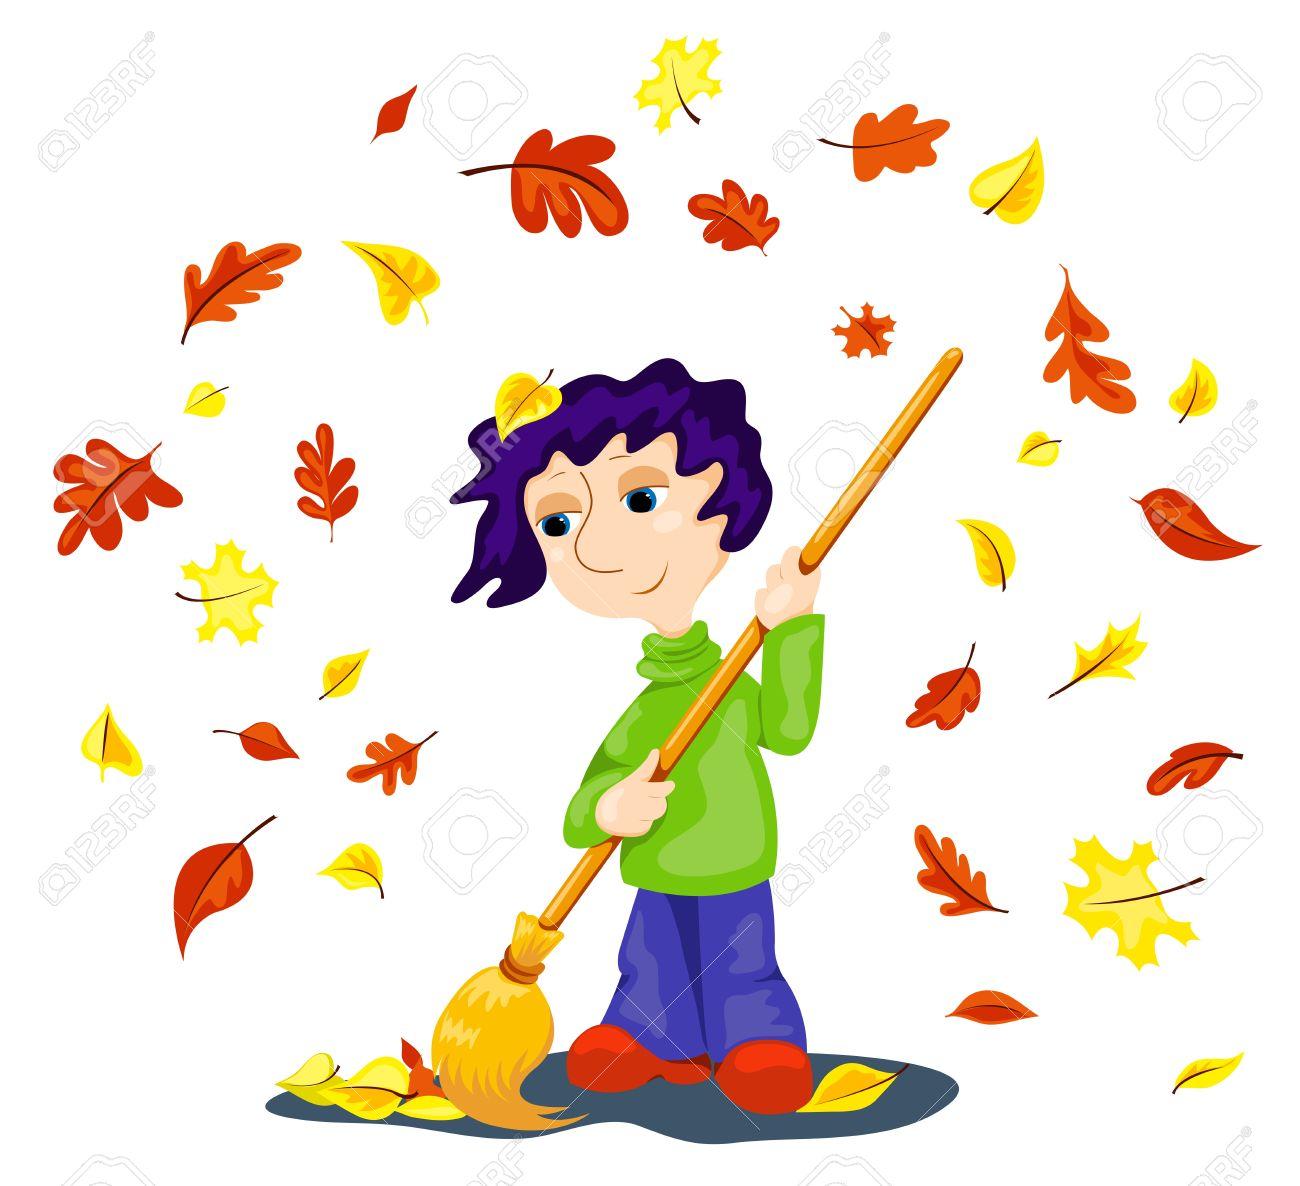 The boy cleans autumn leaves. Cartoon vector illustration. Stock Vector - 10569760